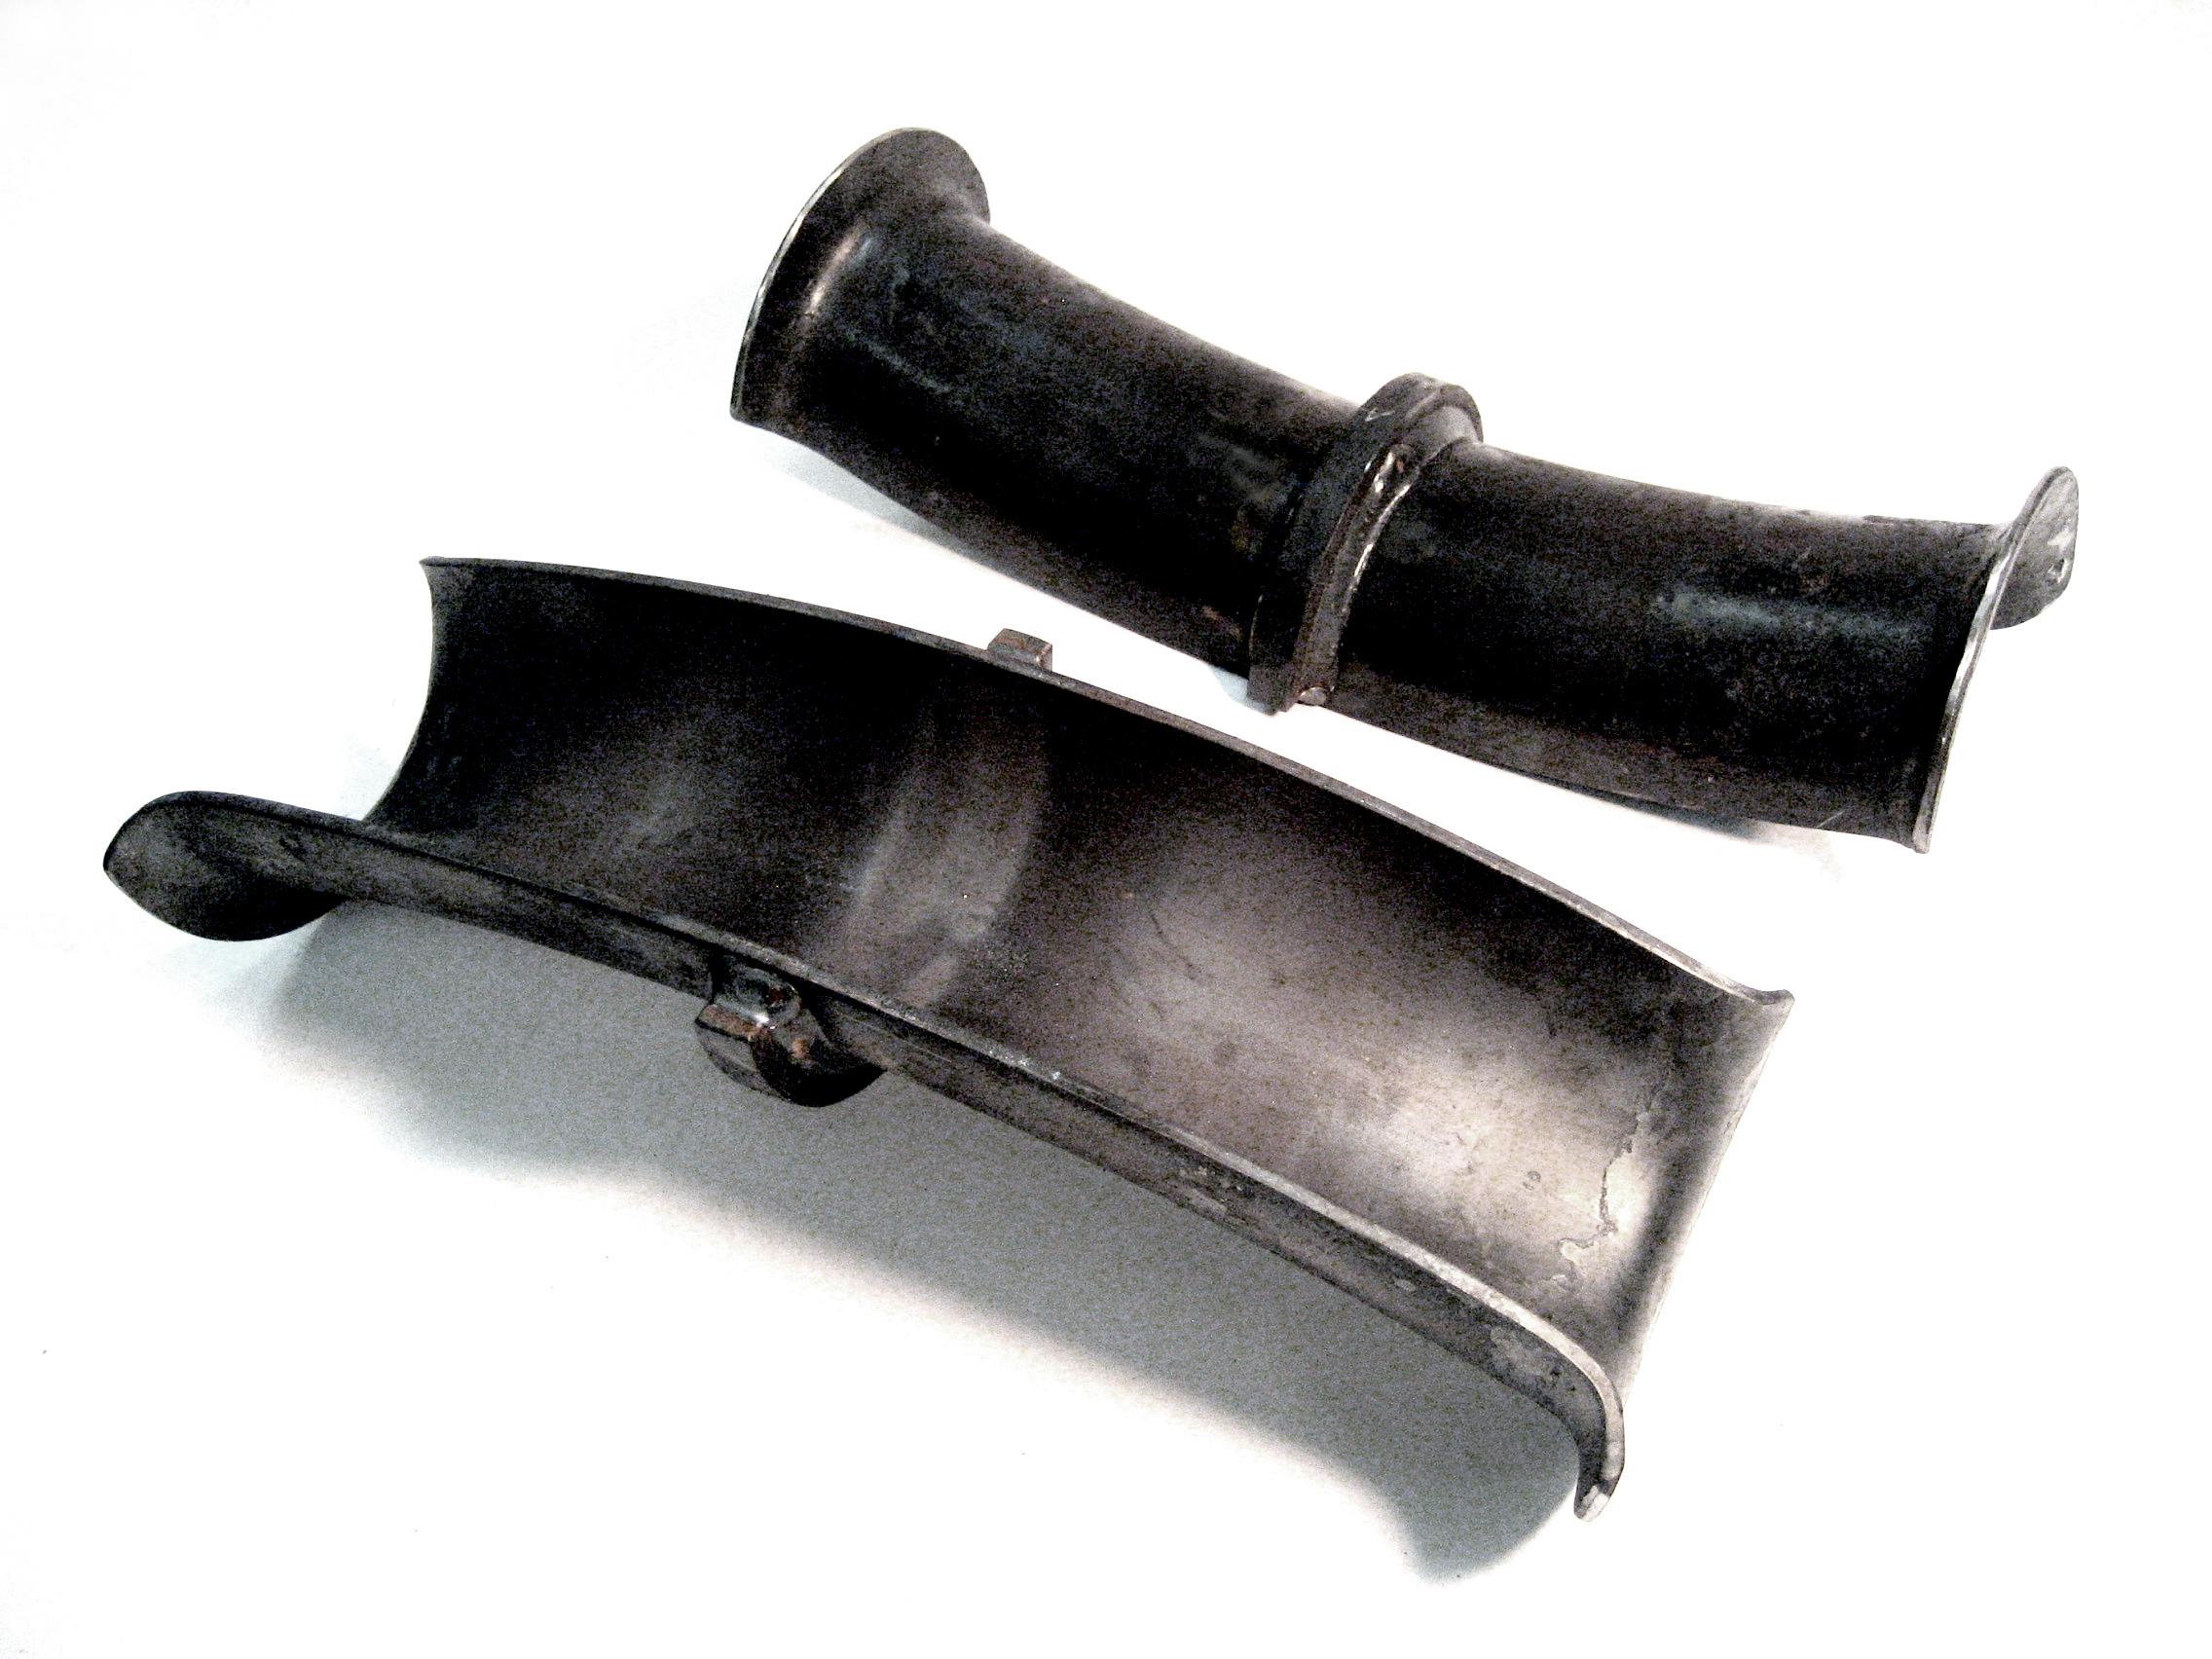 blacksmith forging gallery rose metal industries. Black Bedroom Furniture Sets. Home Design Ideas